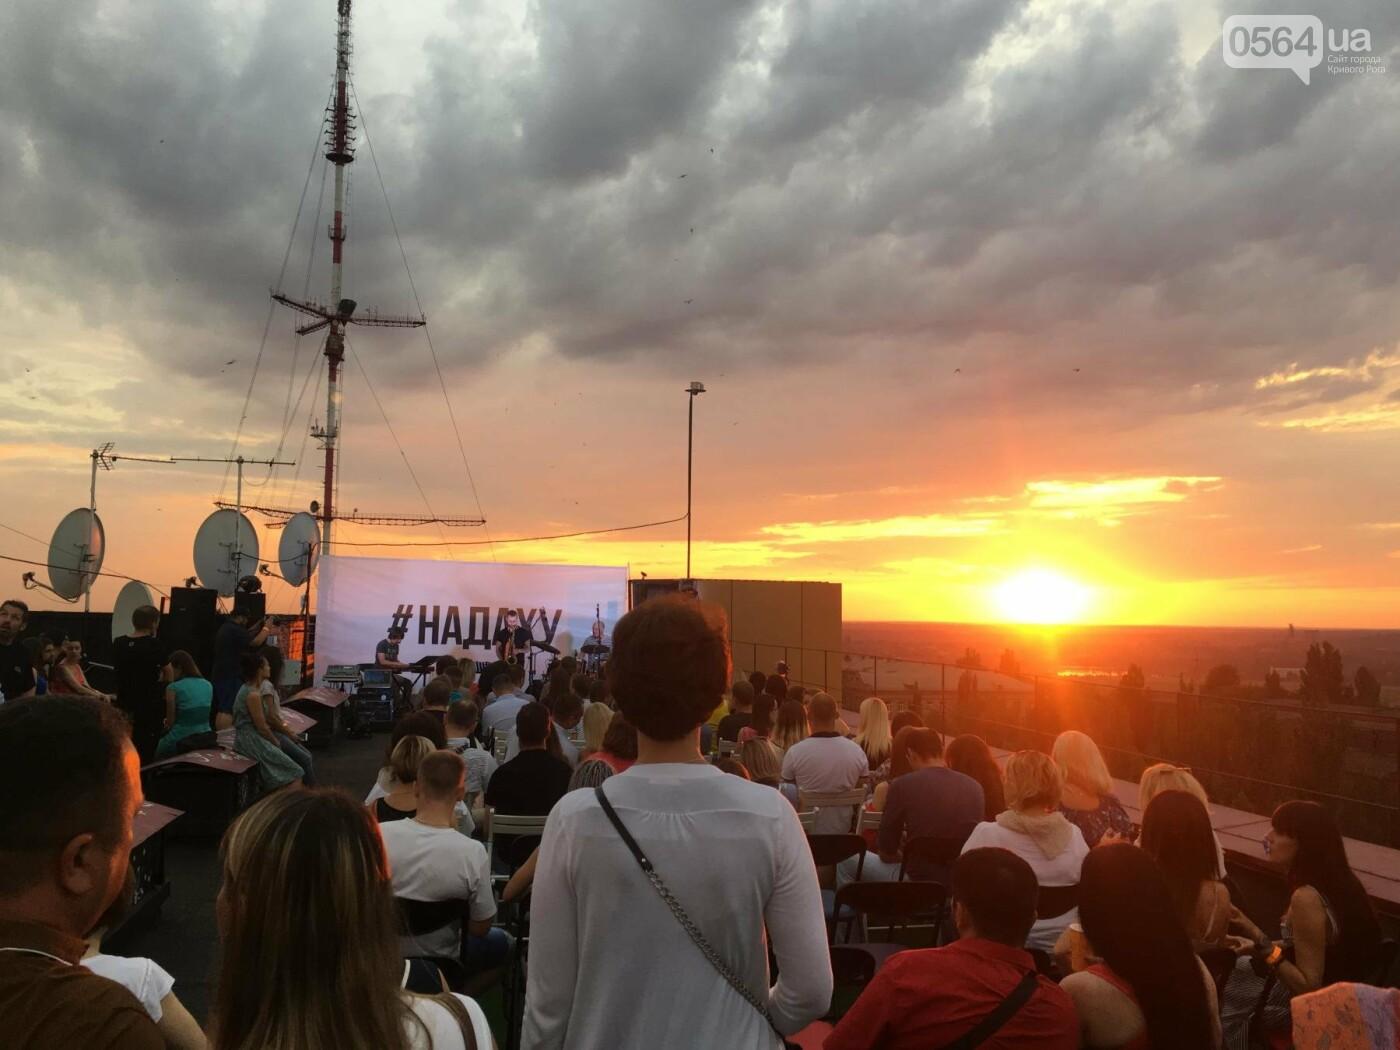 Сотни криворожан встречали закат на крыше отеля под мелодии джаза, - ФОТО, ВИДЕО, фото-35